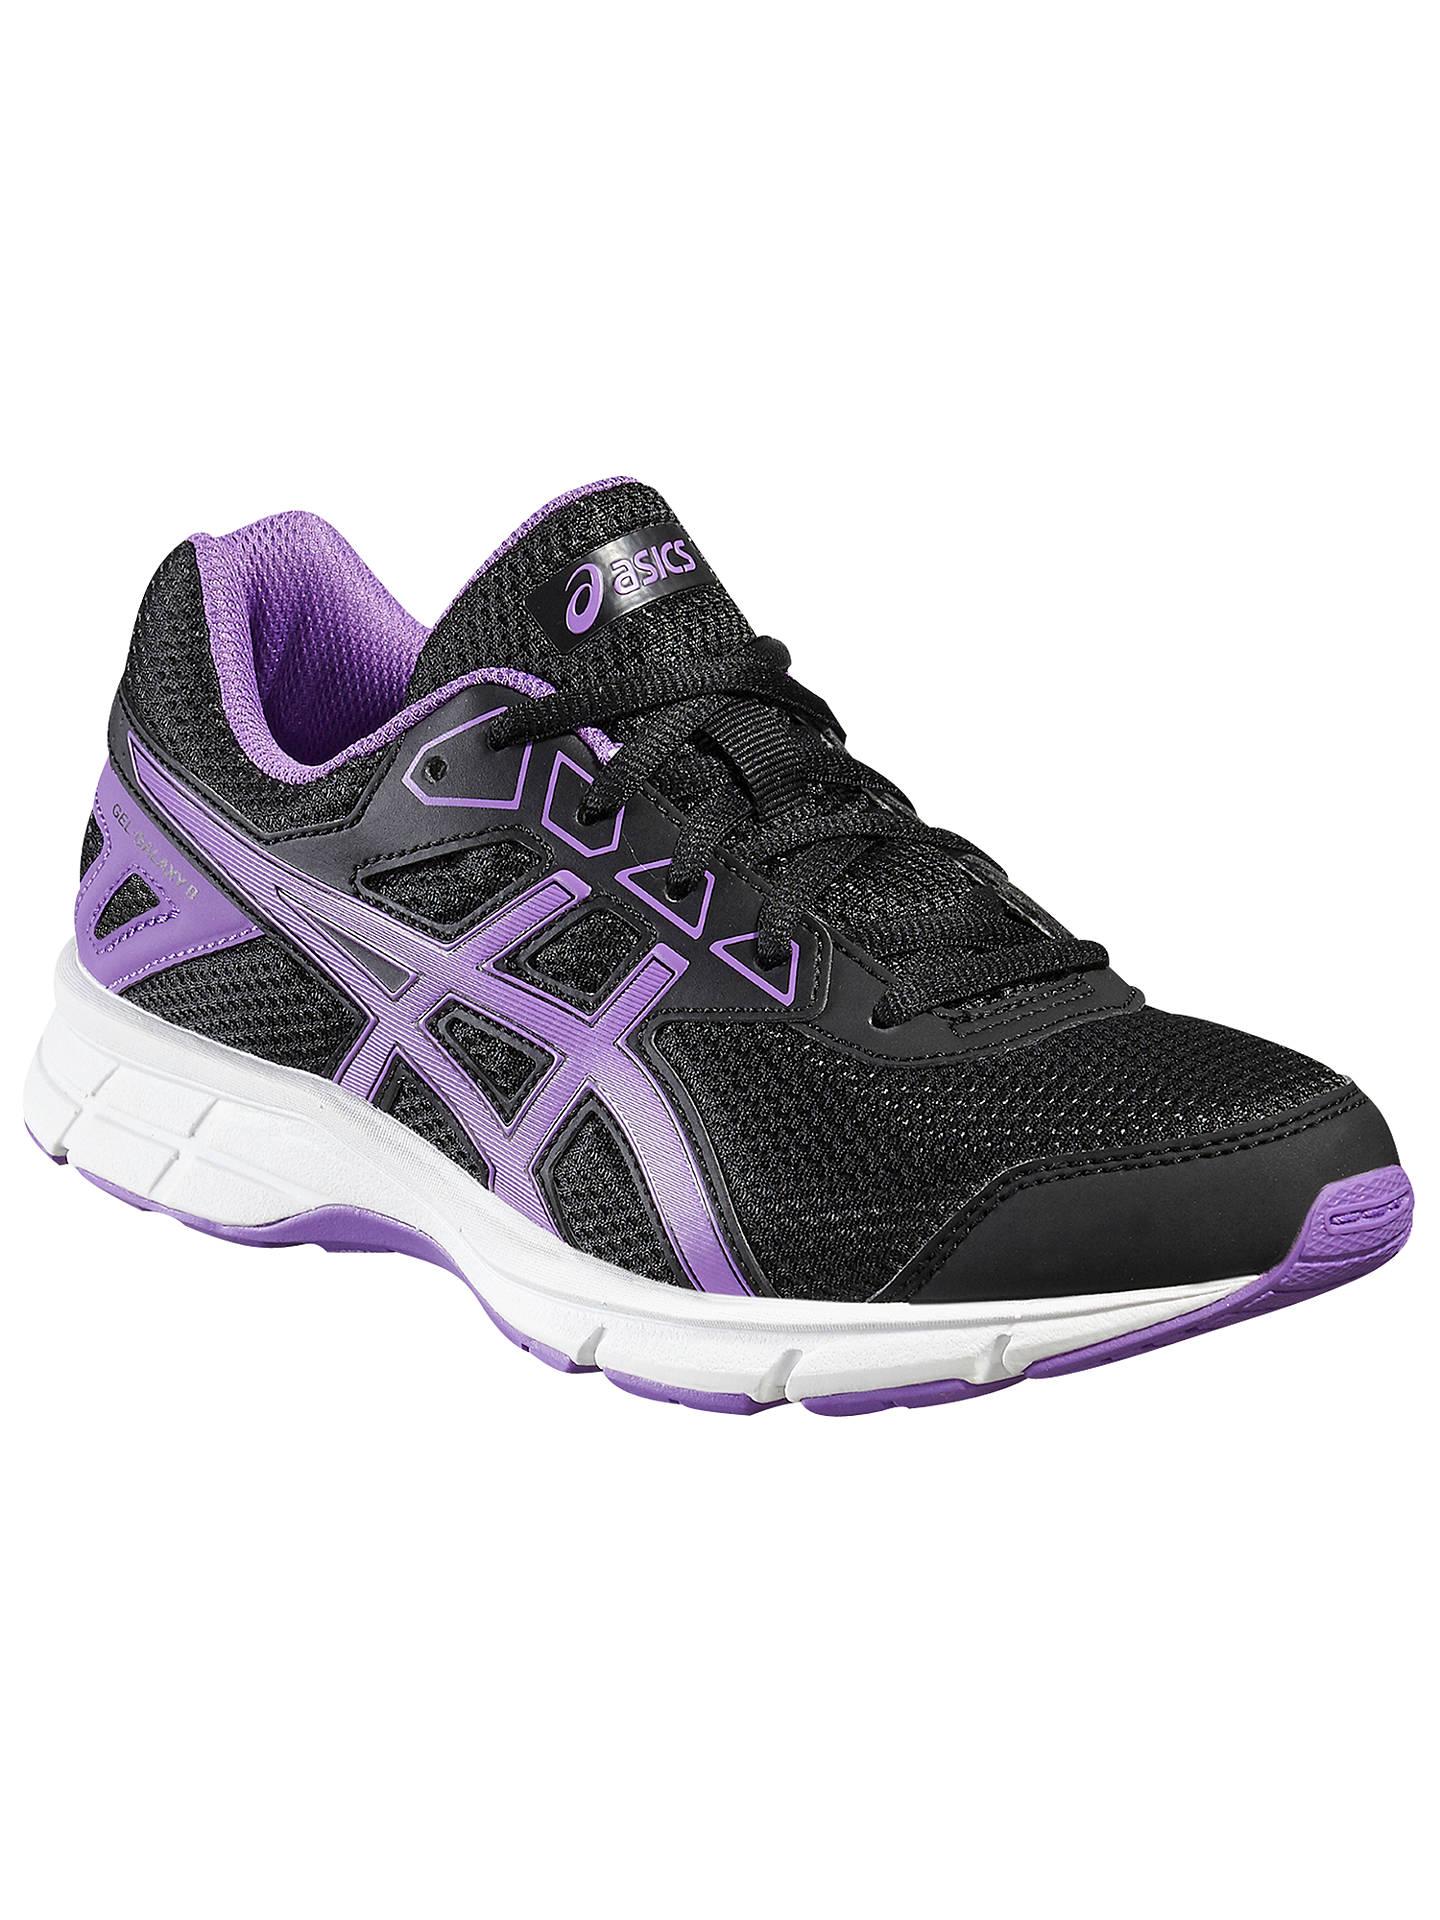 4c35c1ee75fee Buy Asics Children's Gel-Galaxy 9 GS Running Shoes, Black/Purple, 3 ...